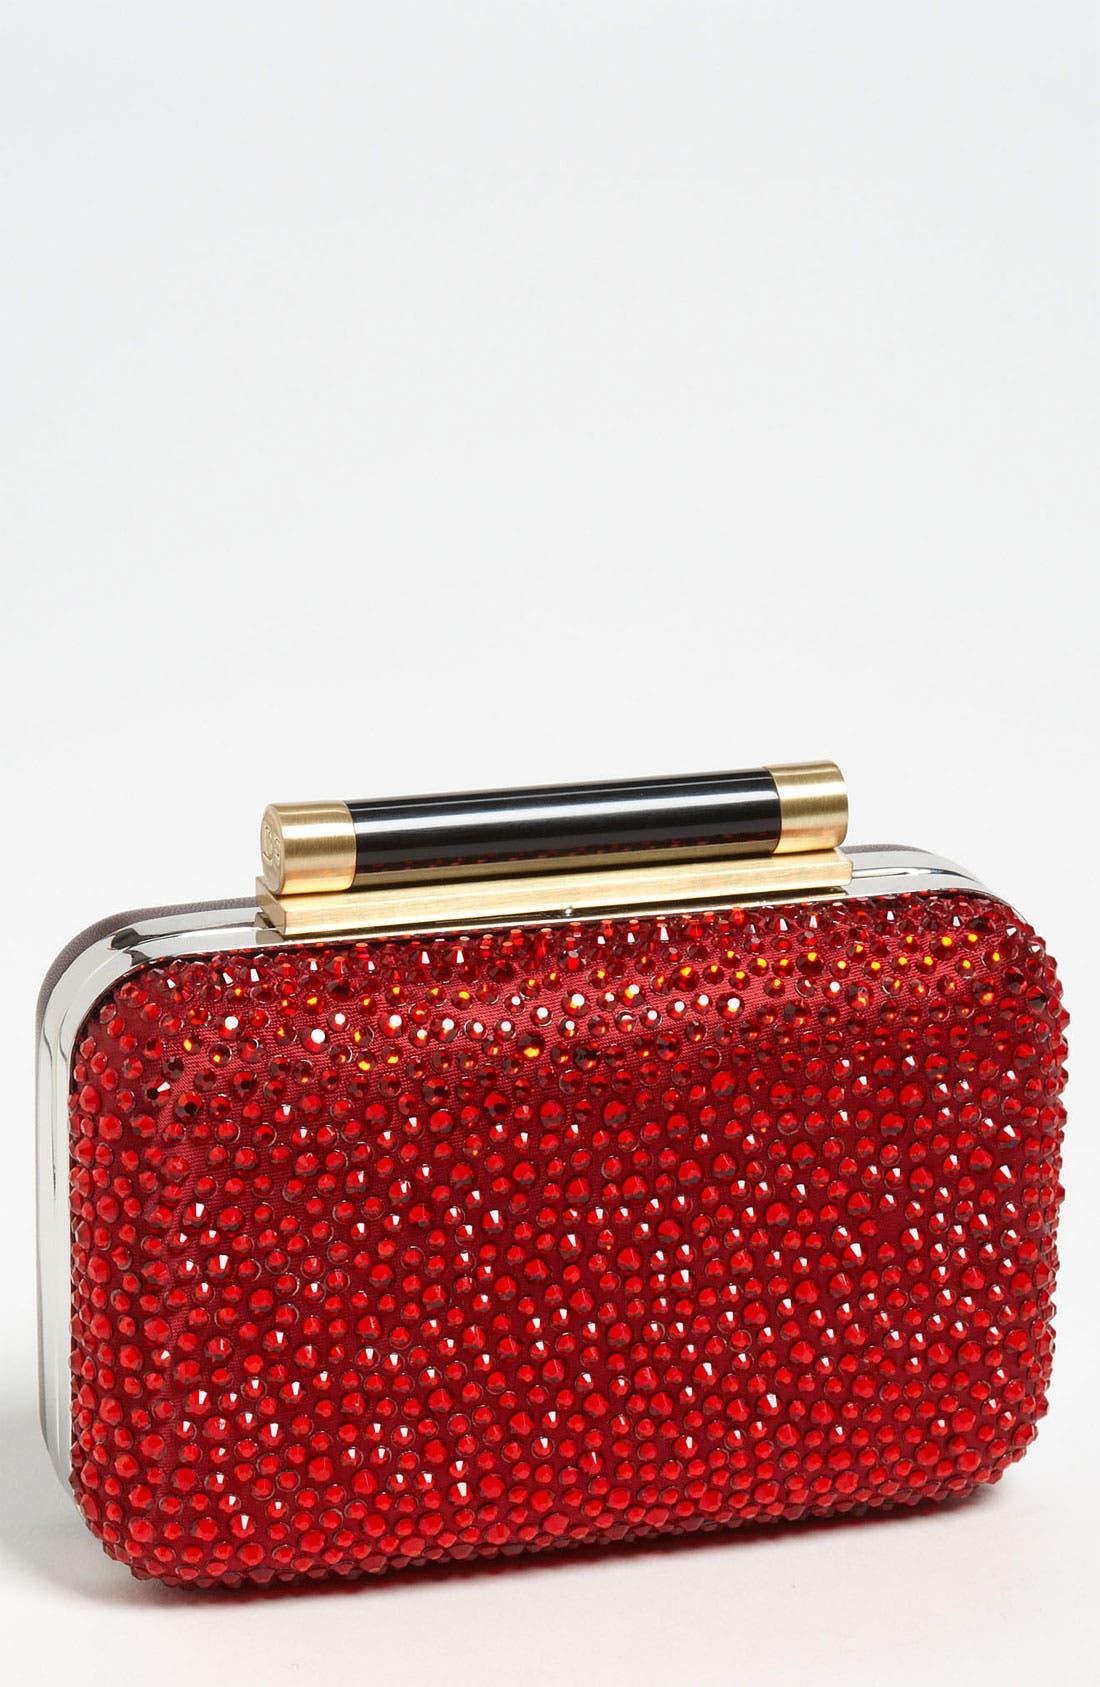 Main Image - Diane von Furstenberg 'Tonda - Small' Crystal & Leather Clutch